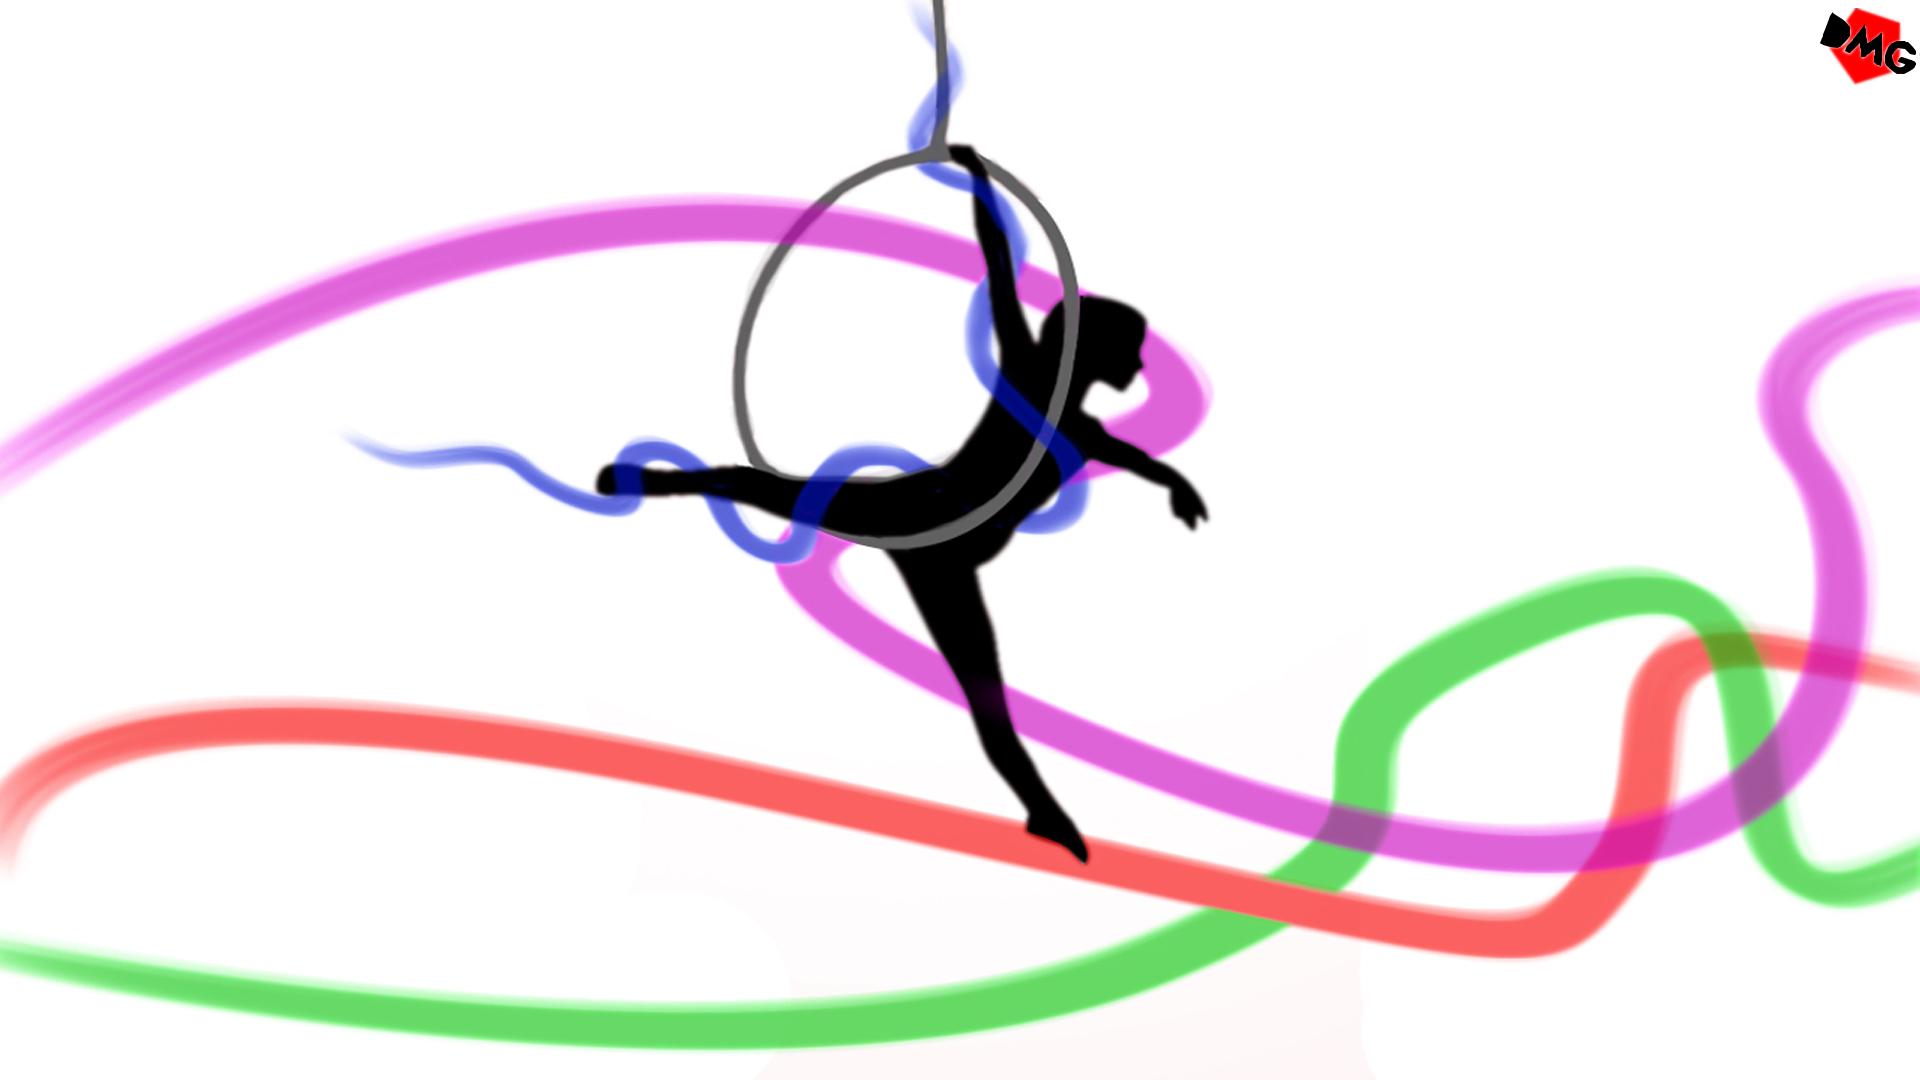 Fall Border Wallpaper For Desktop Gymnastics Wallpapers Hd Pixelstalk Net